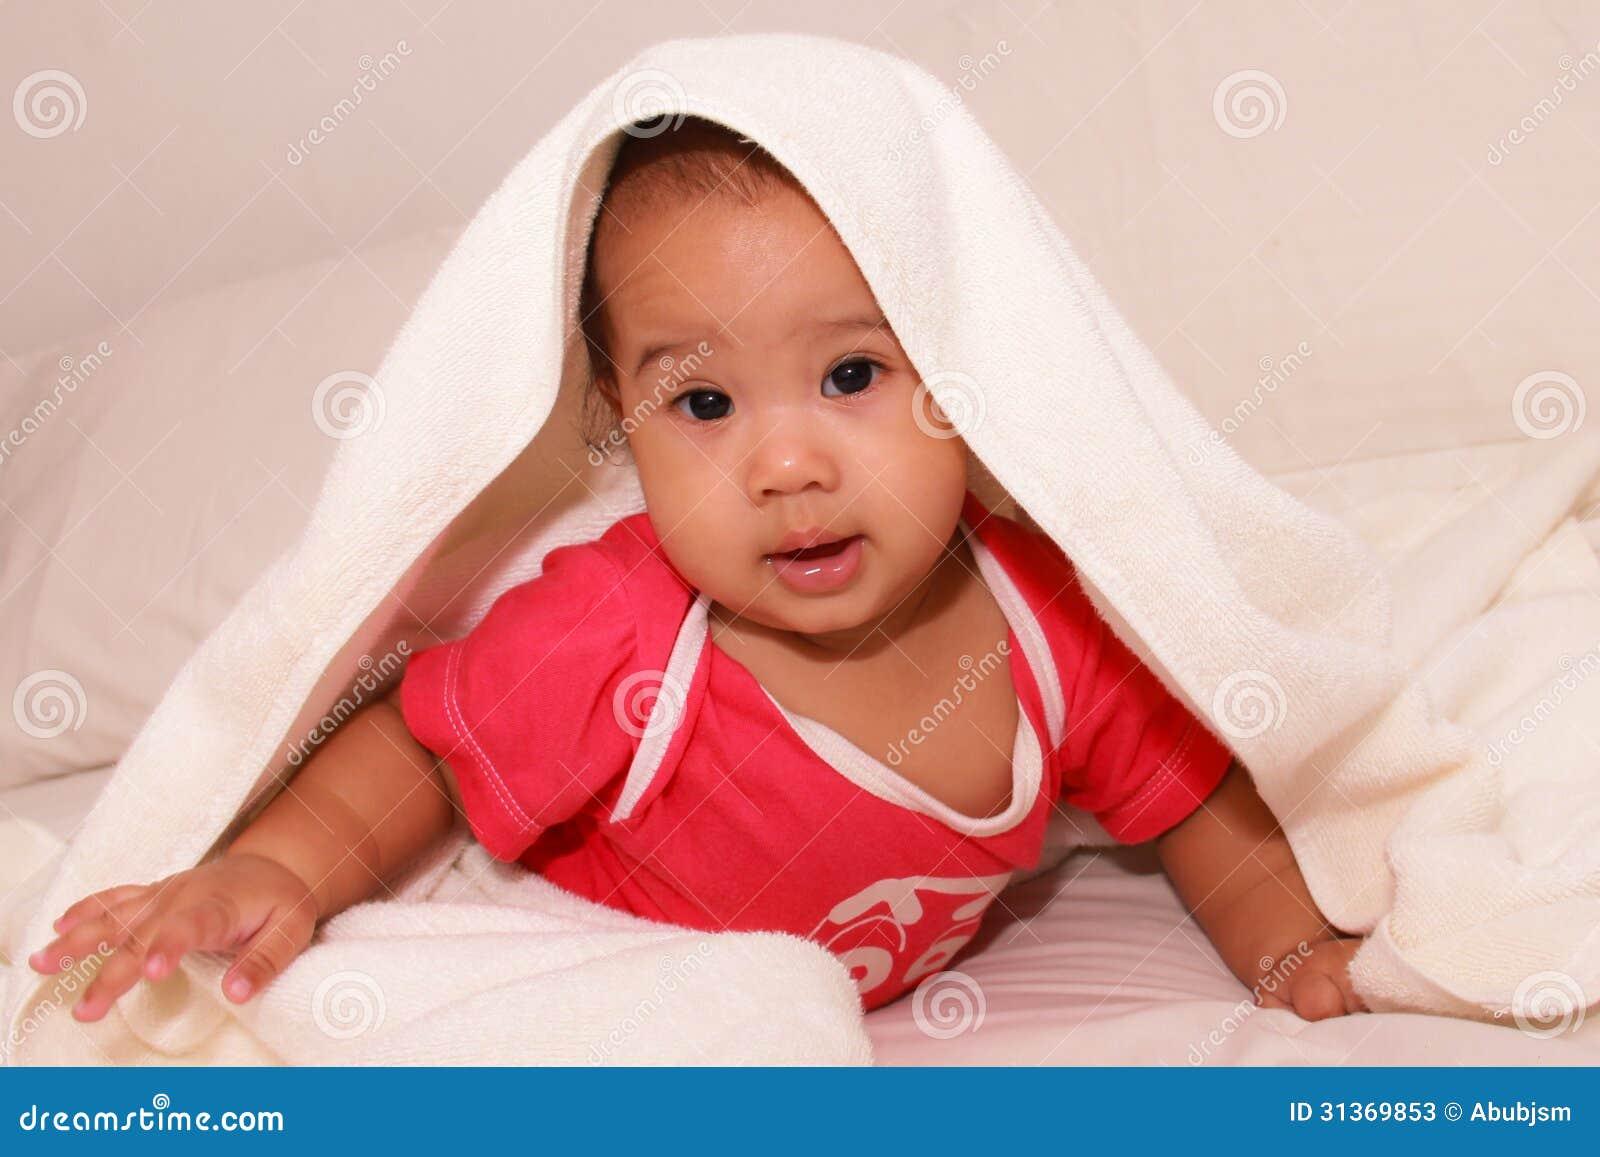 Asian Baby Nursery 72